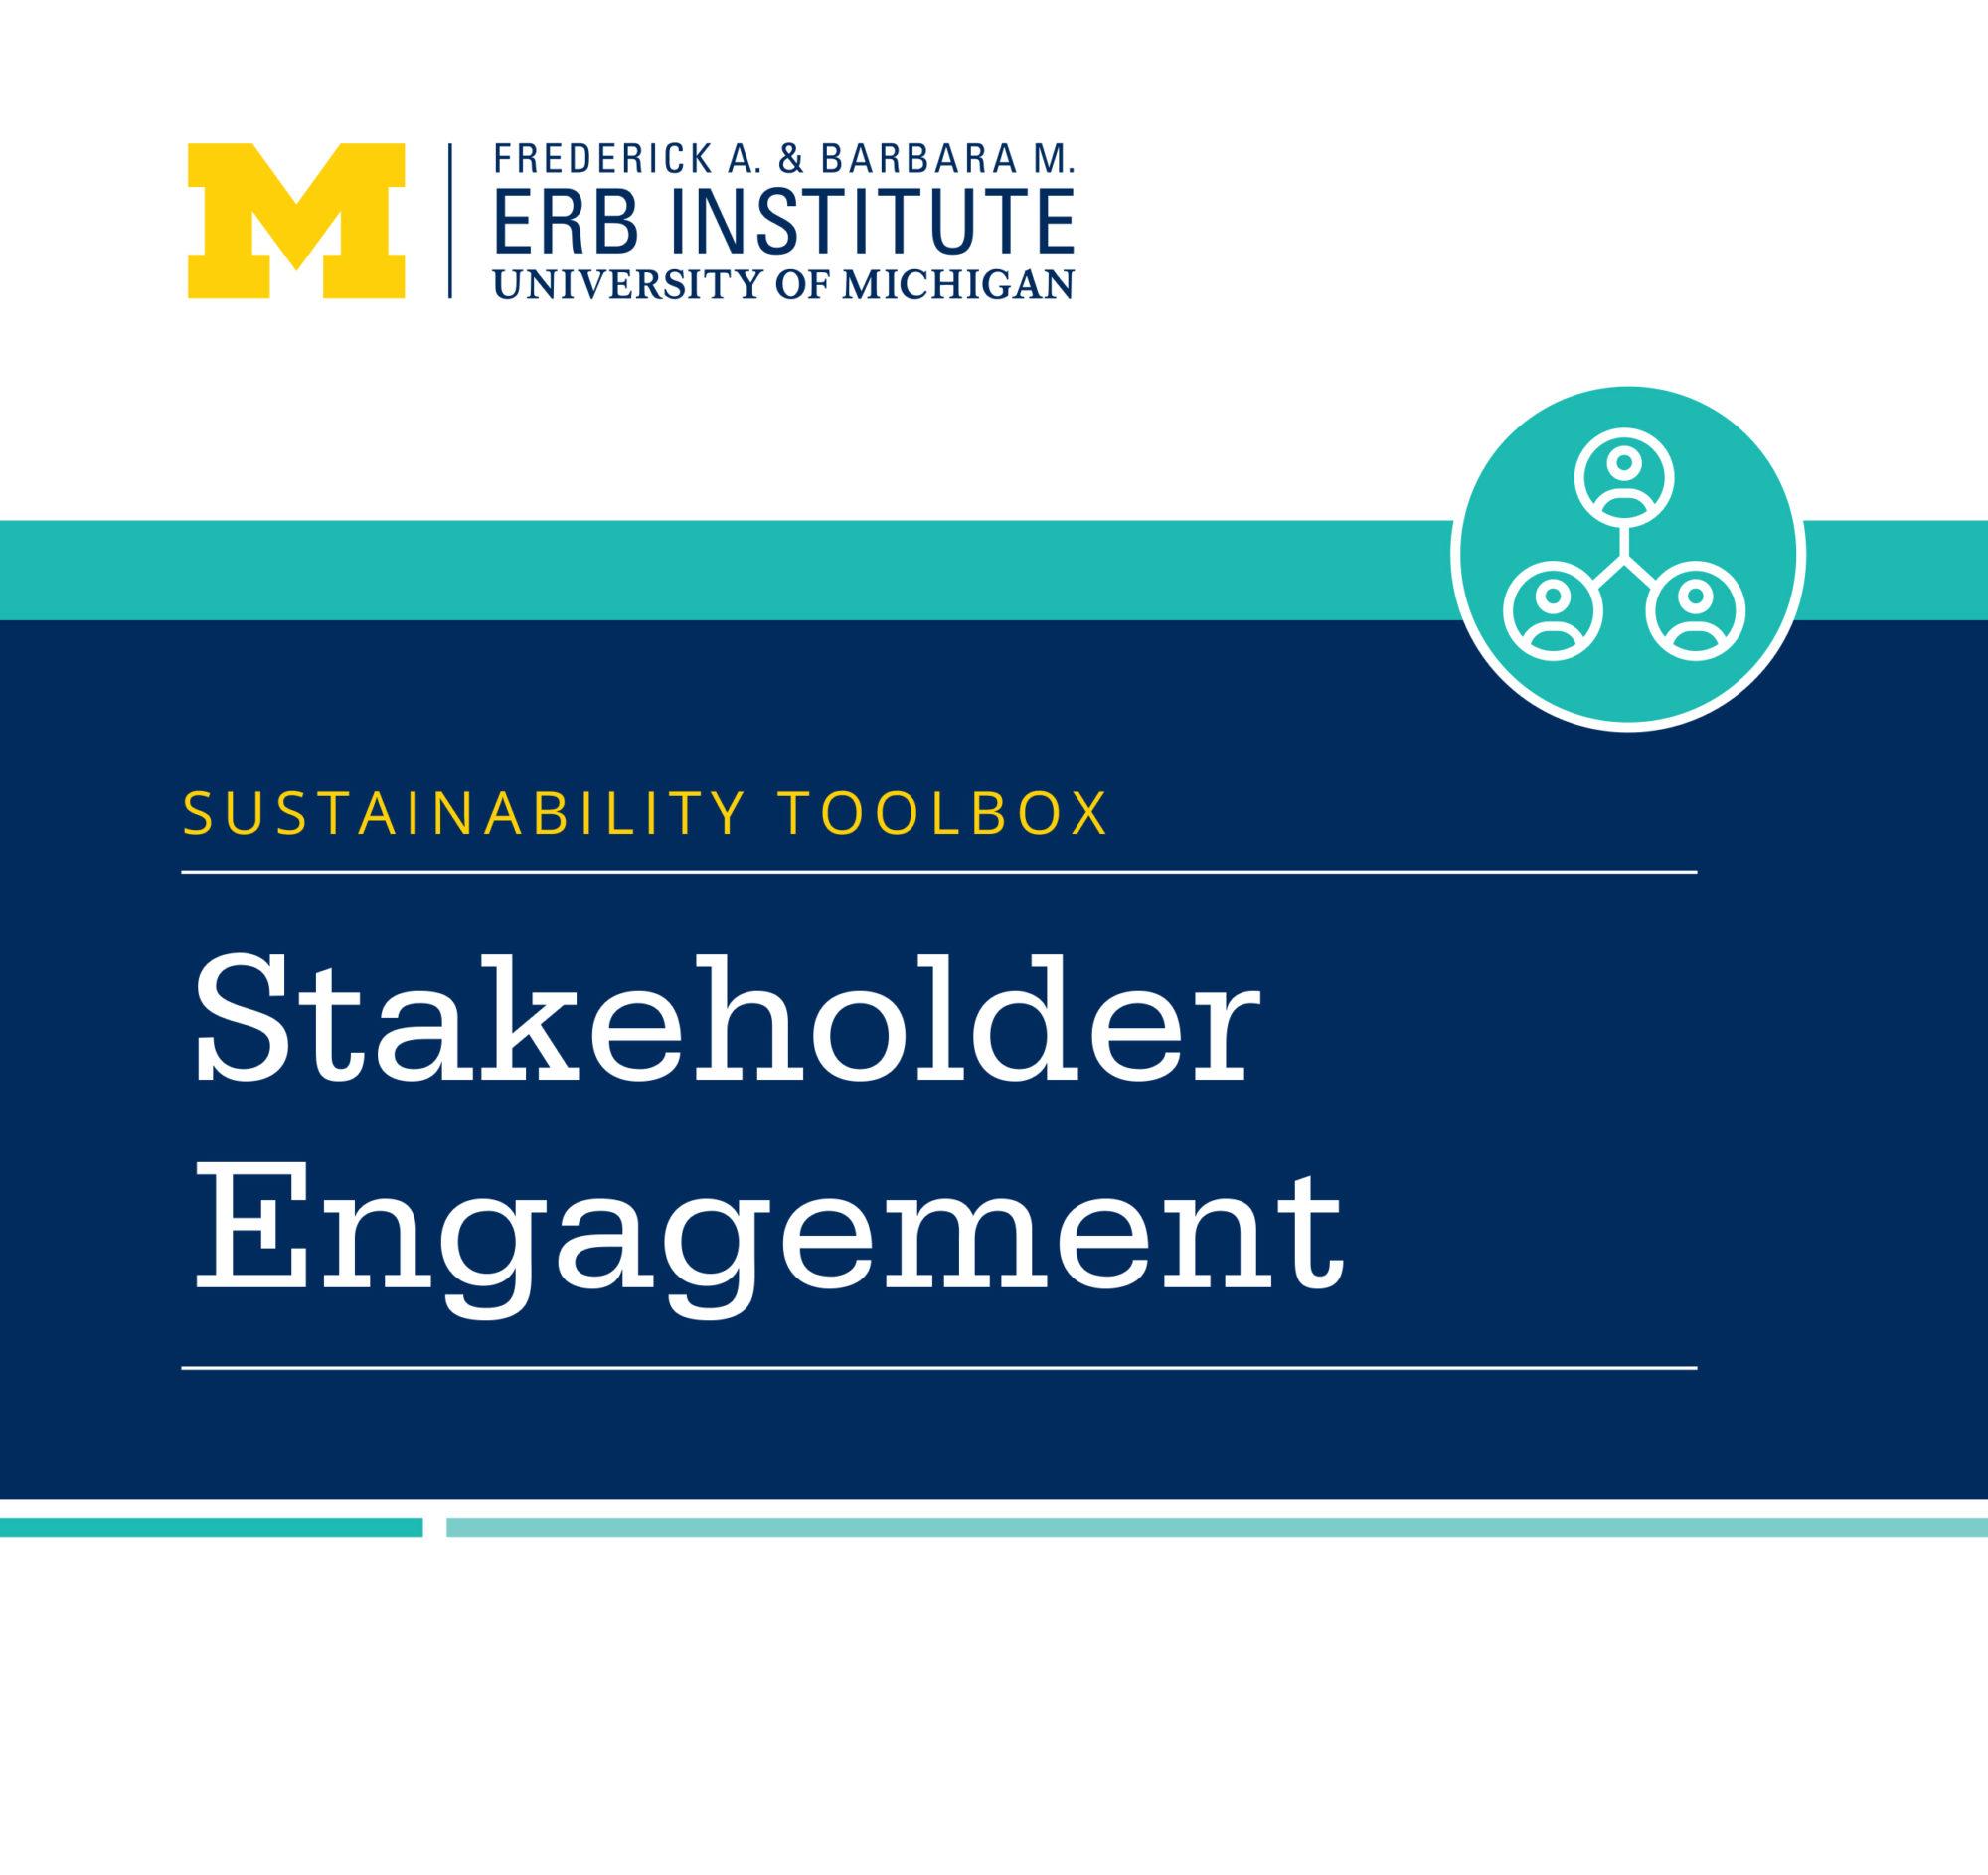 Sustainability Toolbox: Stakeholder Engagement